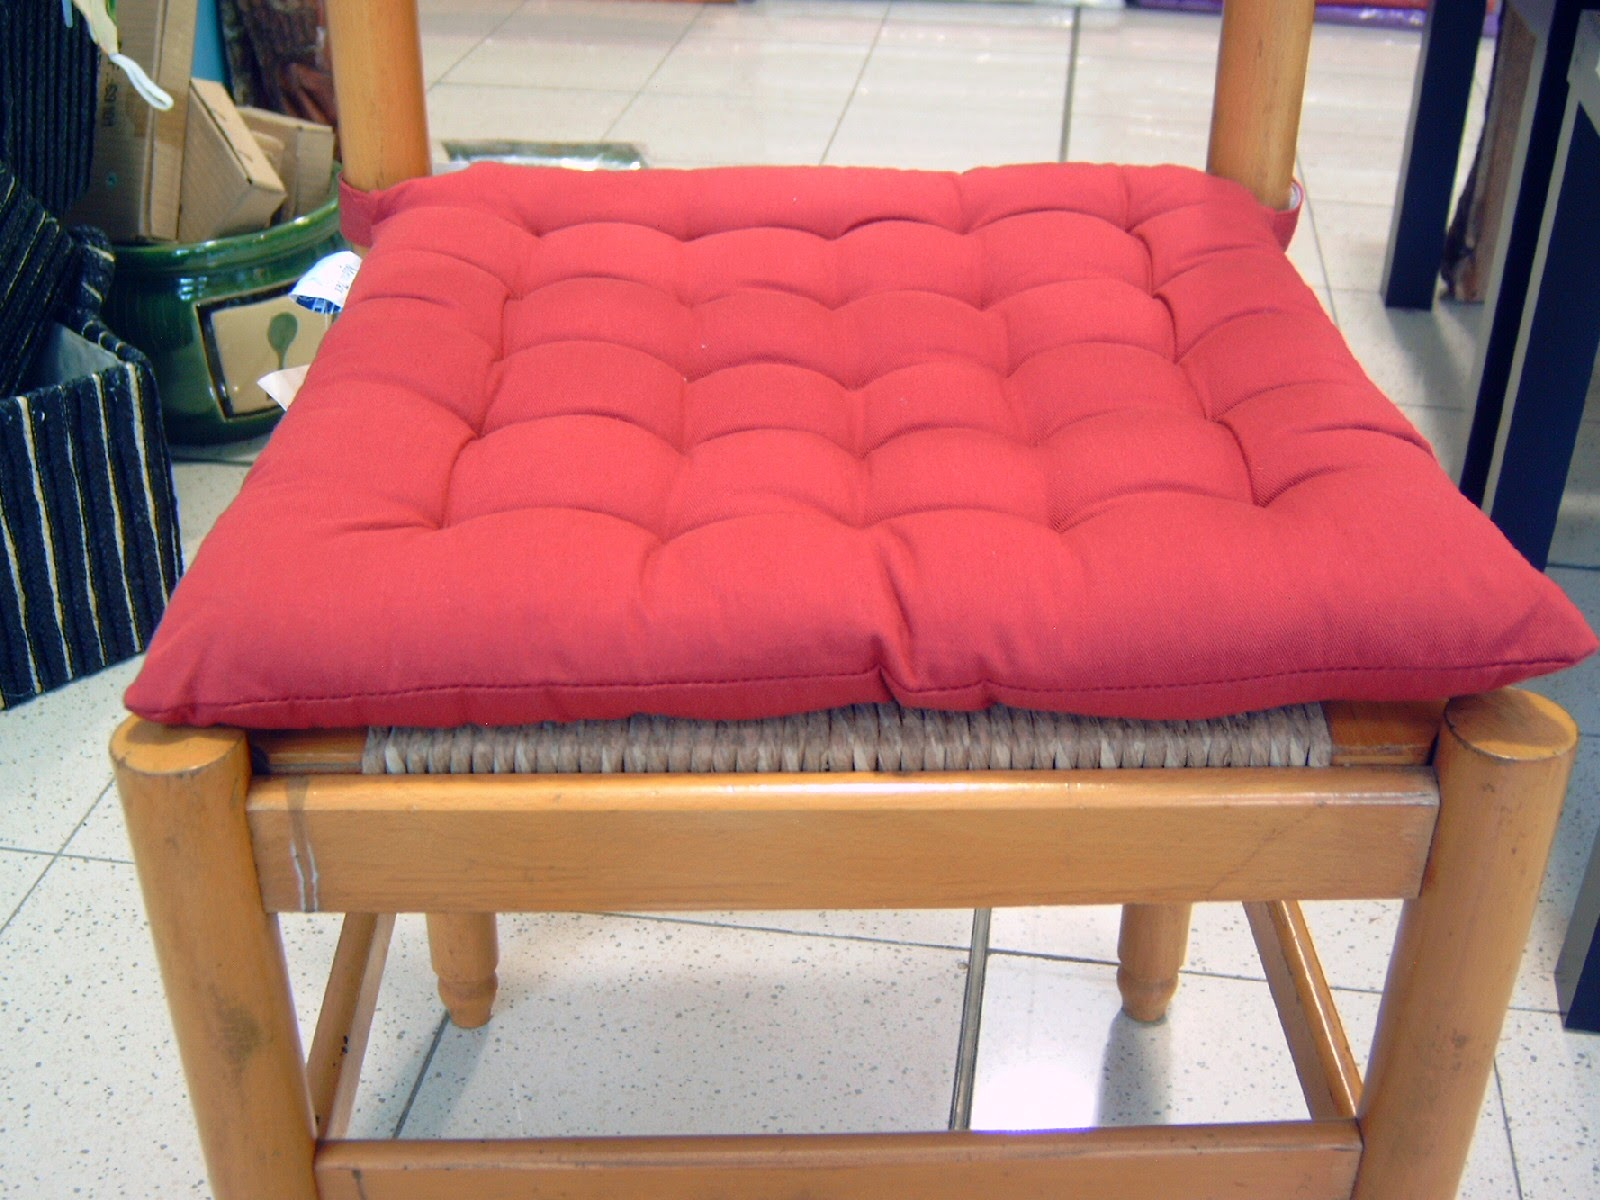 Tappeti da cucina a basso costo tappetomania tappeti - Cuscini sedie ikea ...